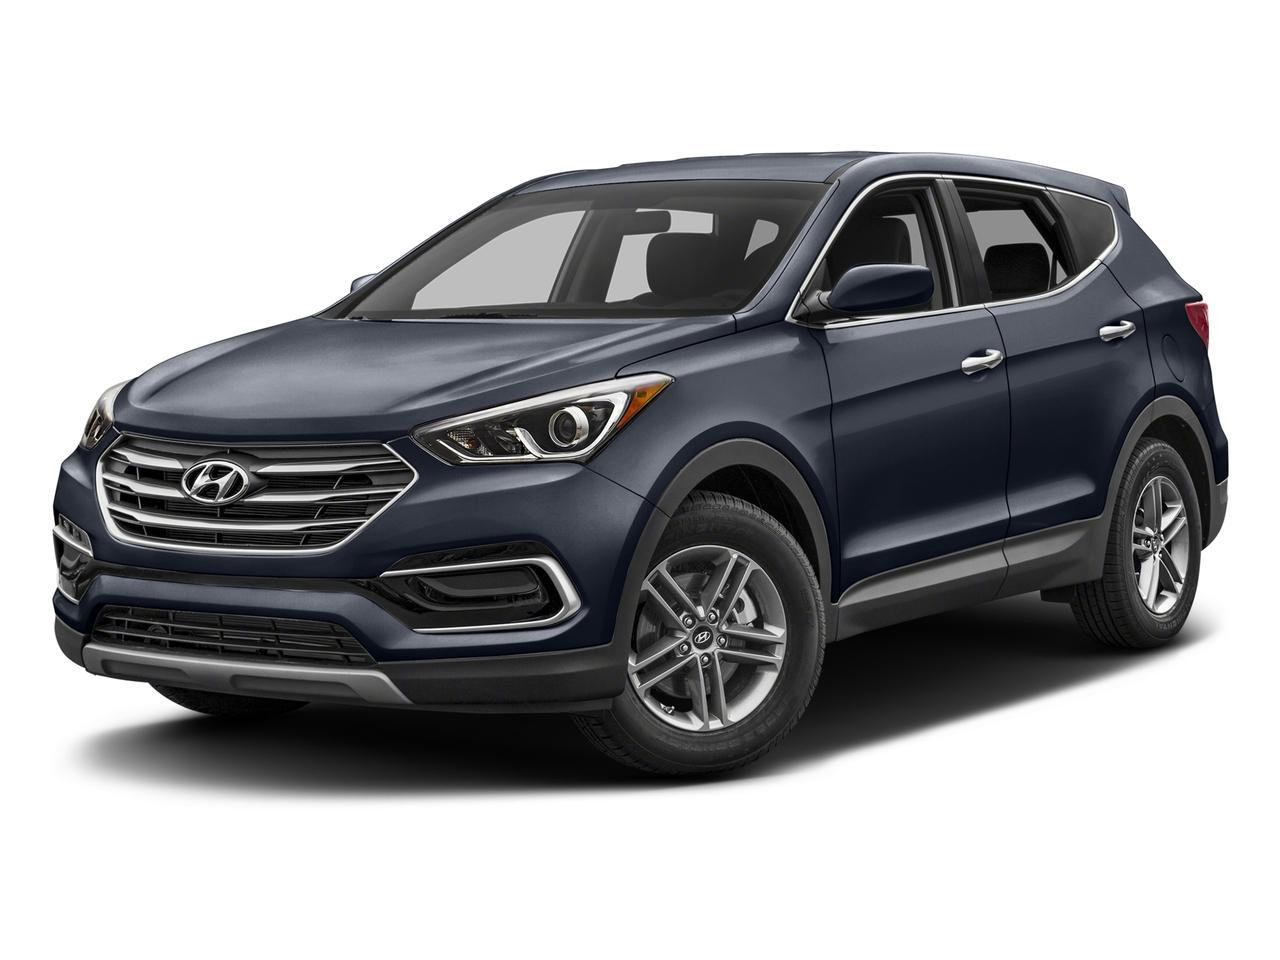 2017 Hyundai Santa Fe Sport Vehicle Photo in San Antonio, TX 78230